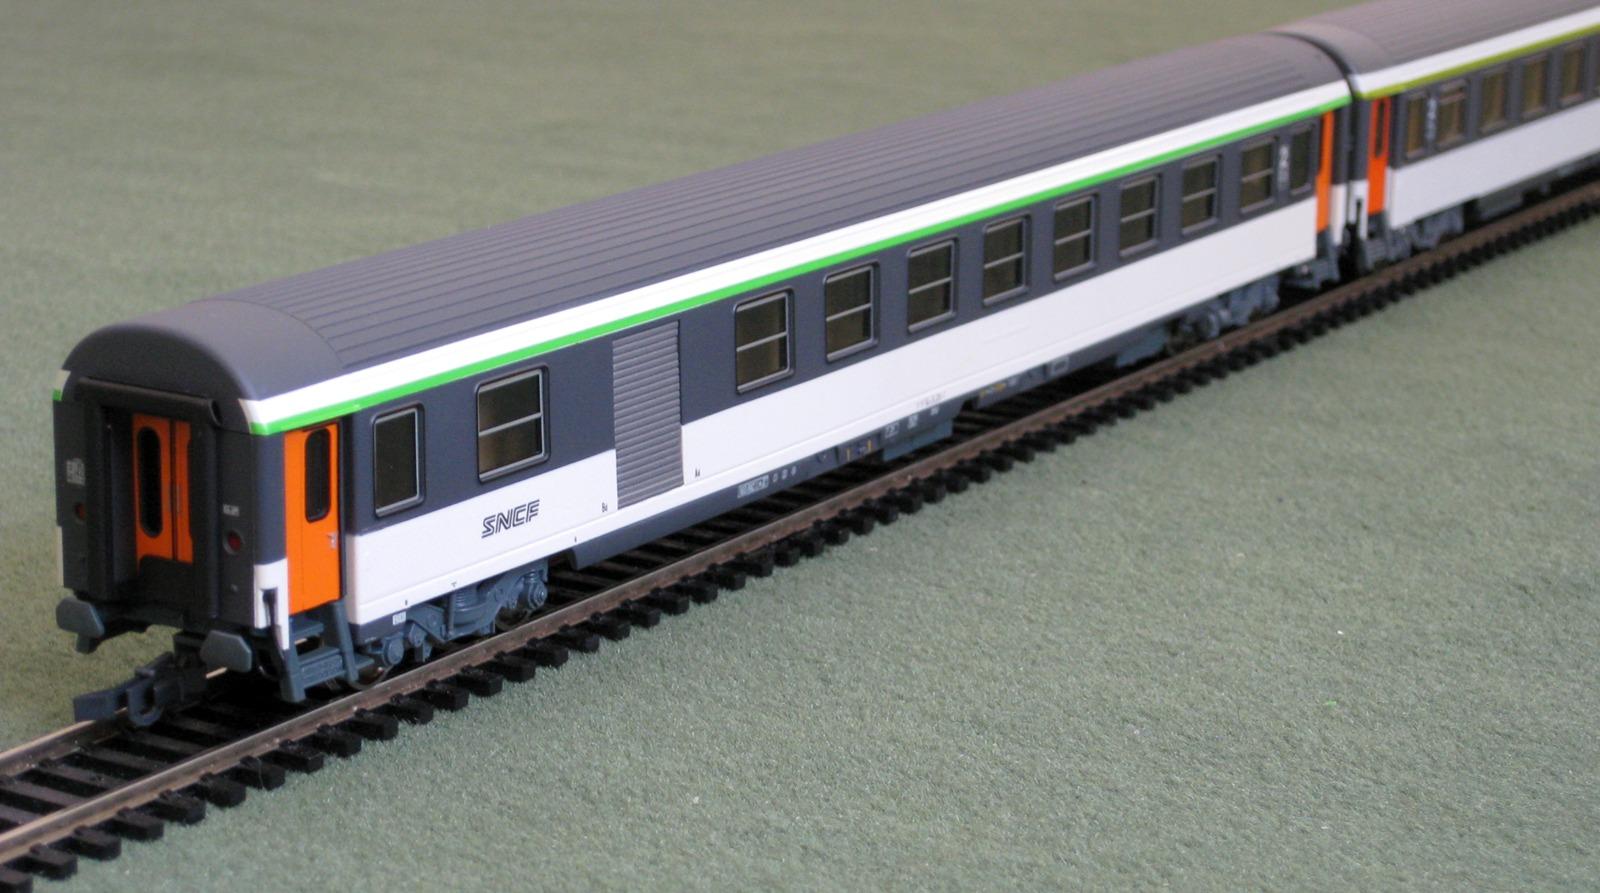 Tag Roco Les Trains Miniatures De Glr Page 3